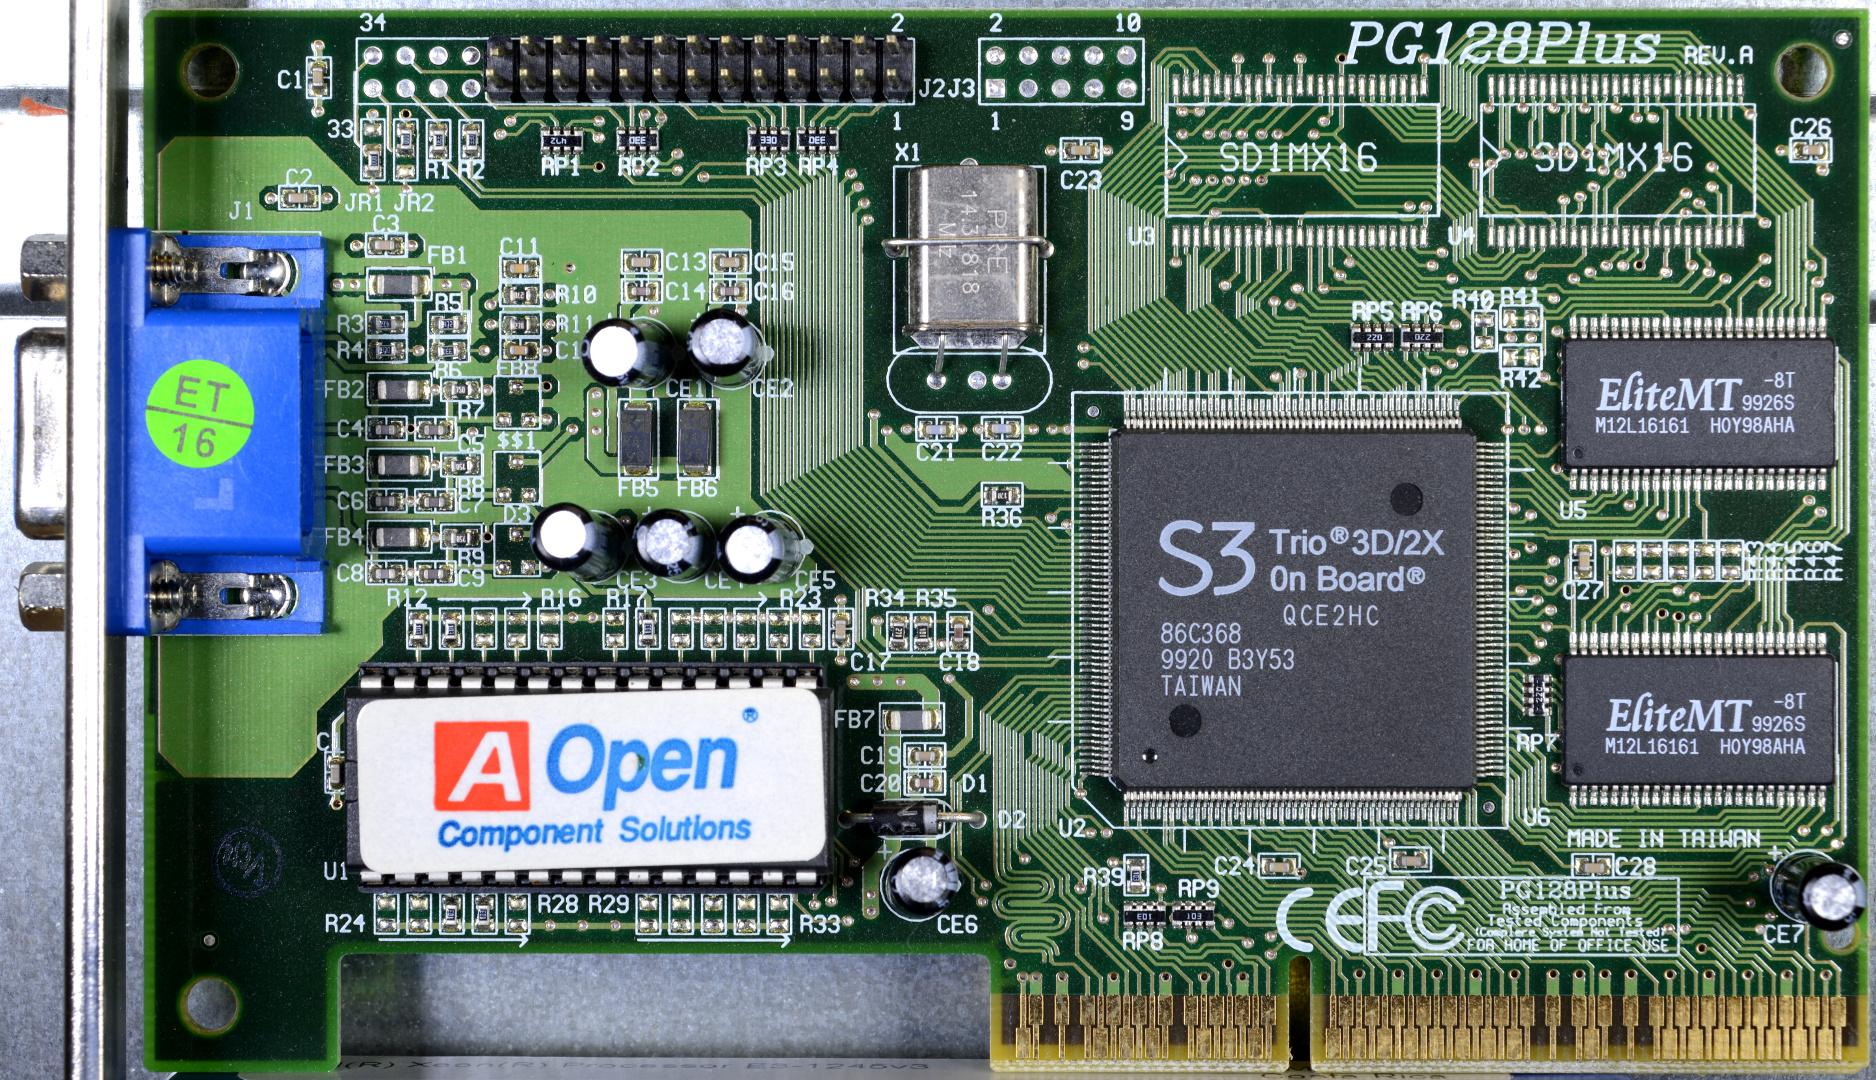 64 pro microsoft corporation driver download: